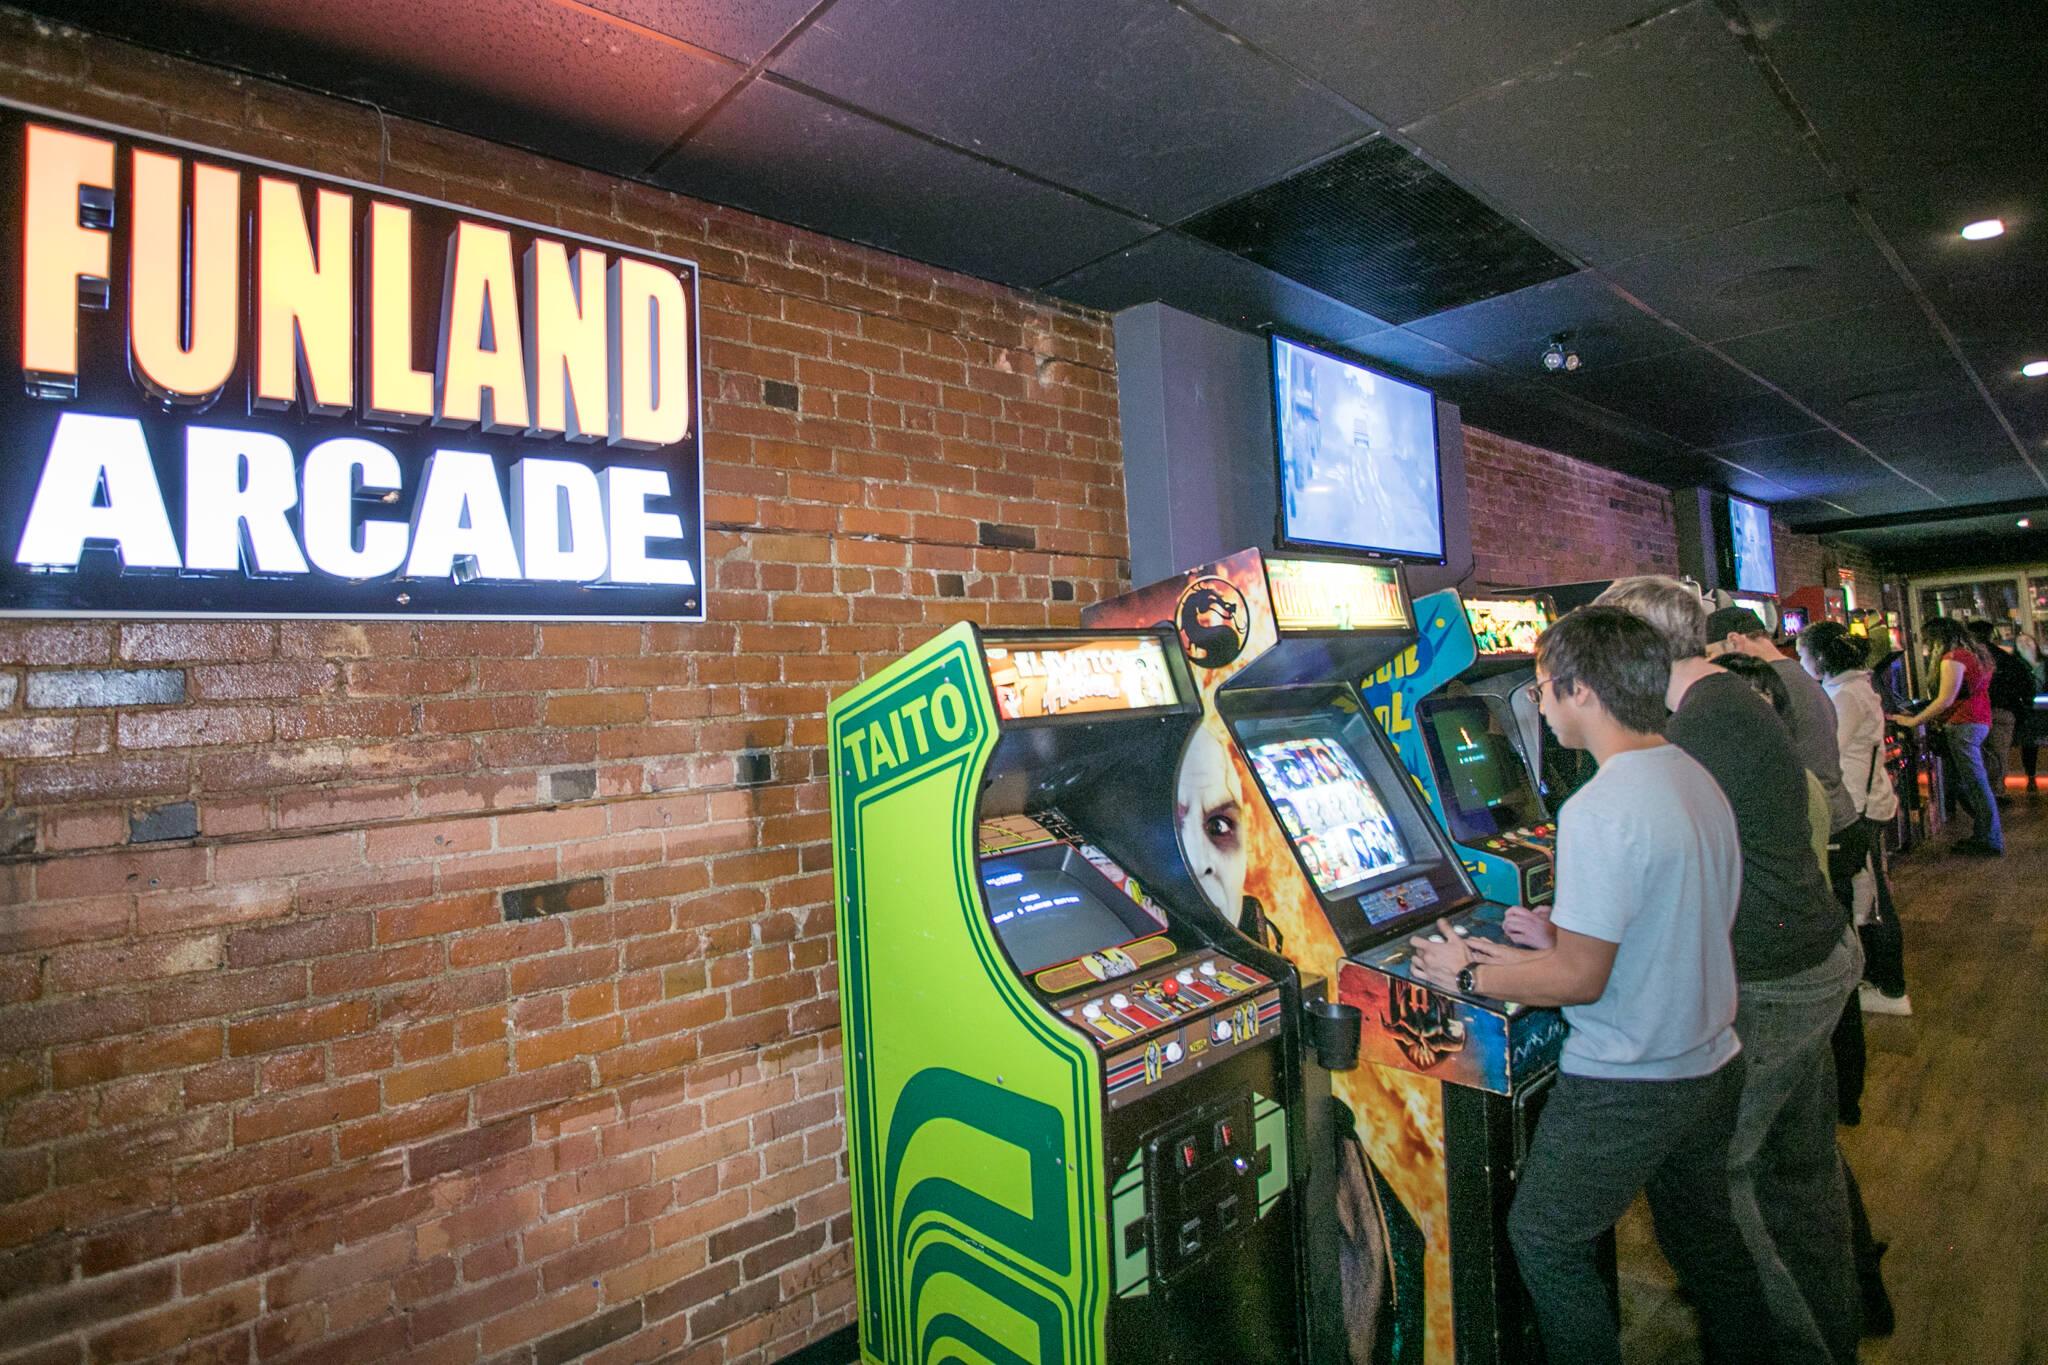 toronto arcades